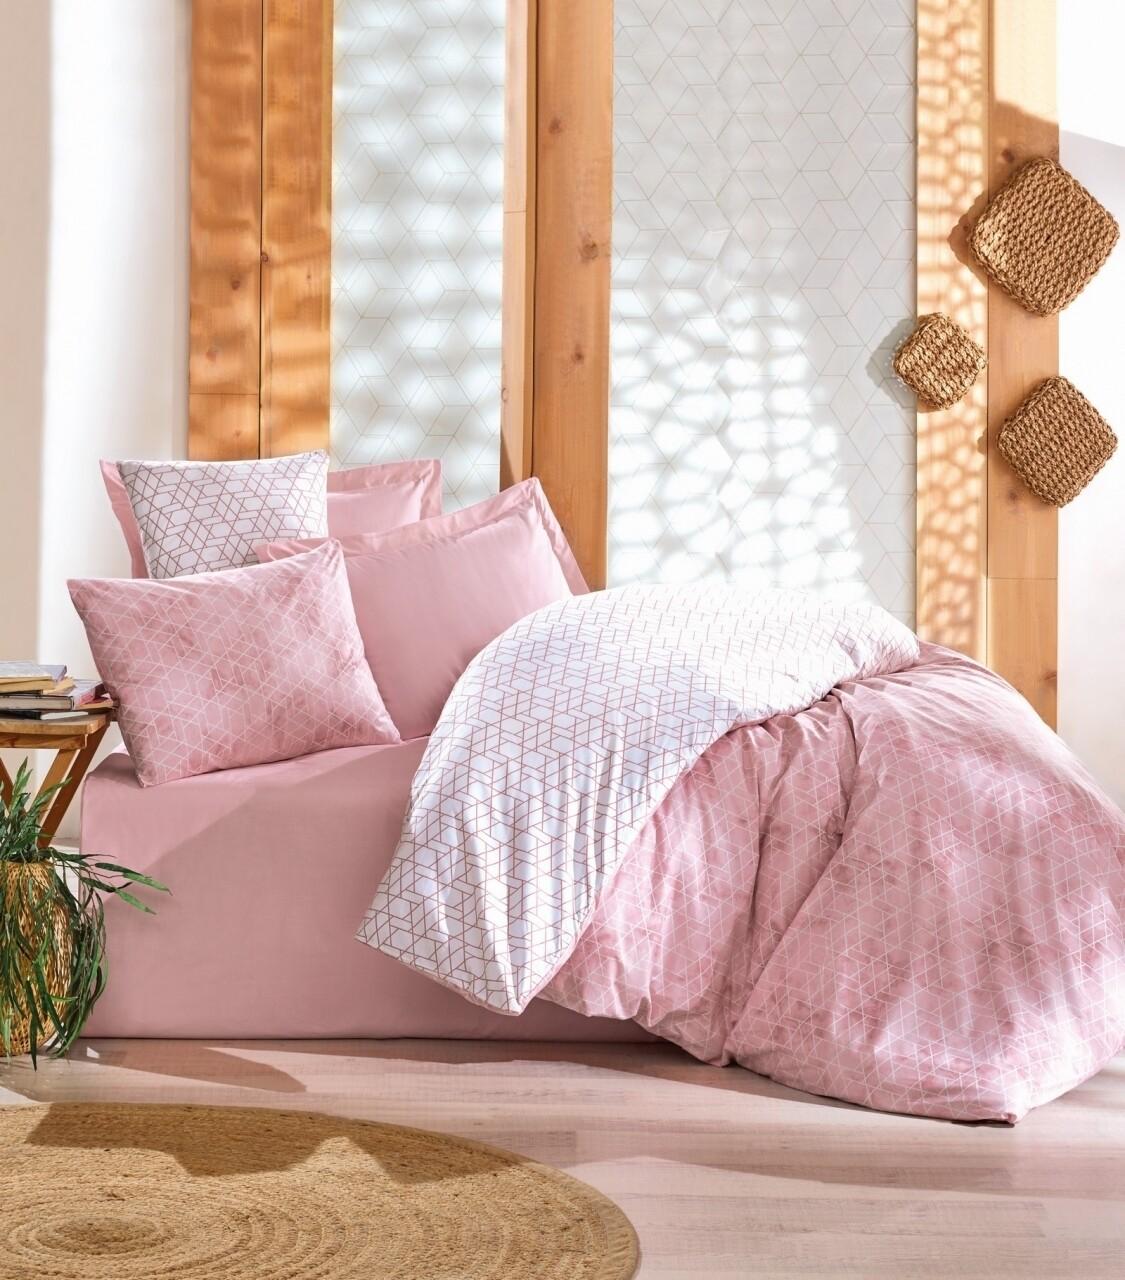 Lenjerie de pat pentru o persoana, 3 piese, 100% bumbac ranforce, Cotton Box, Best